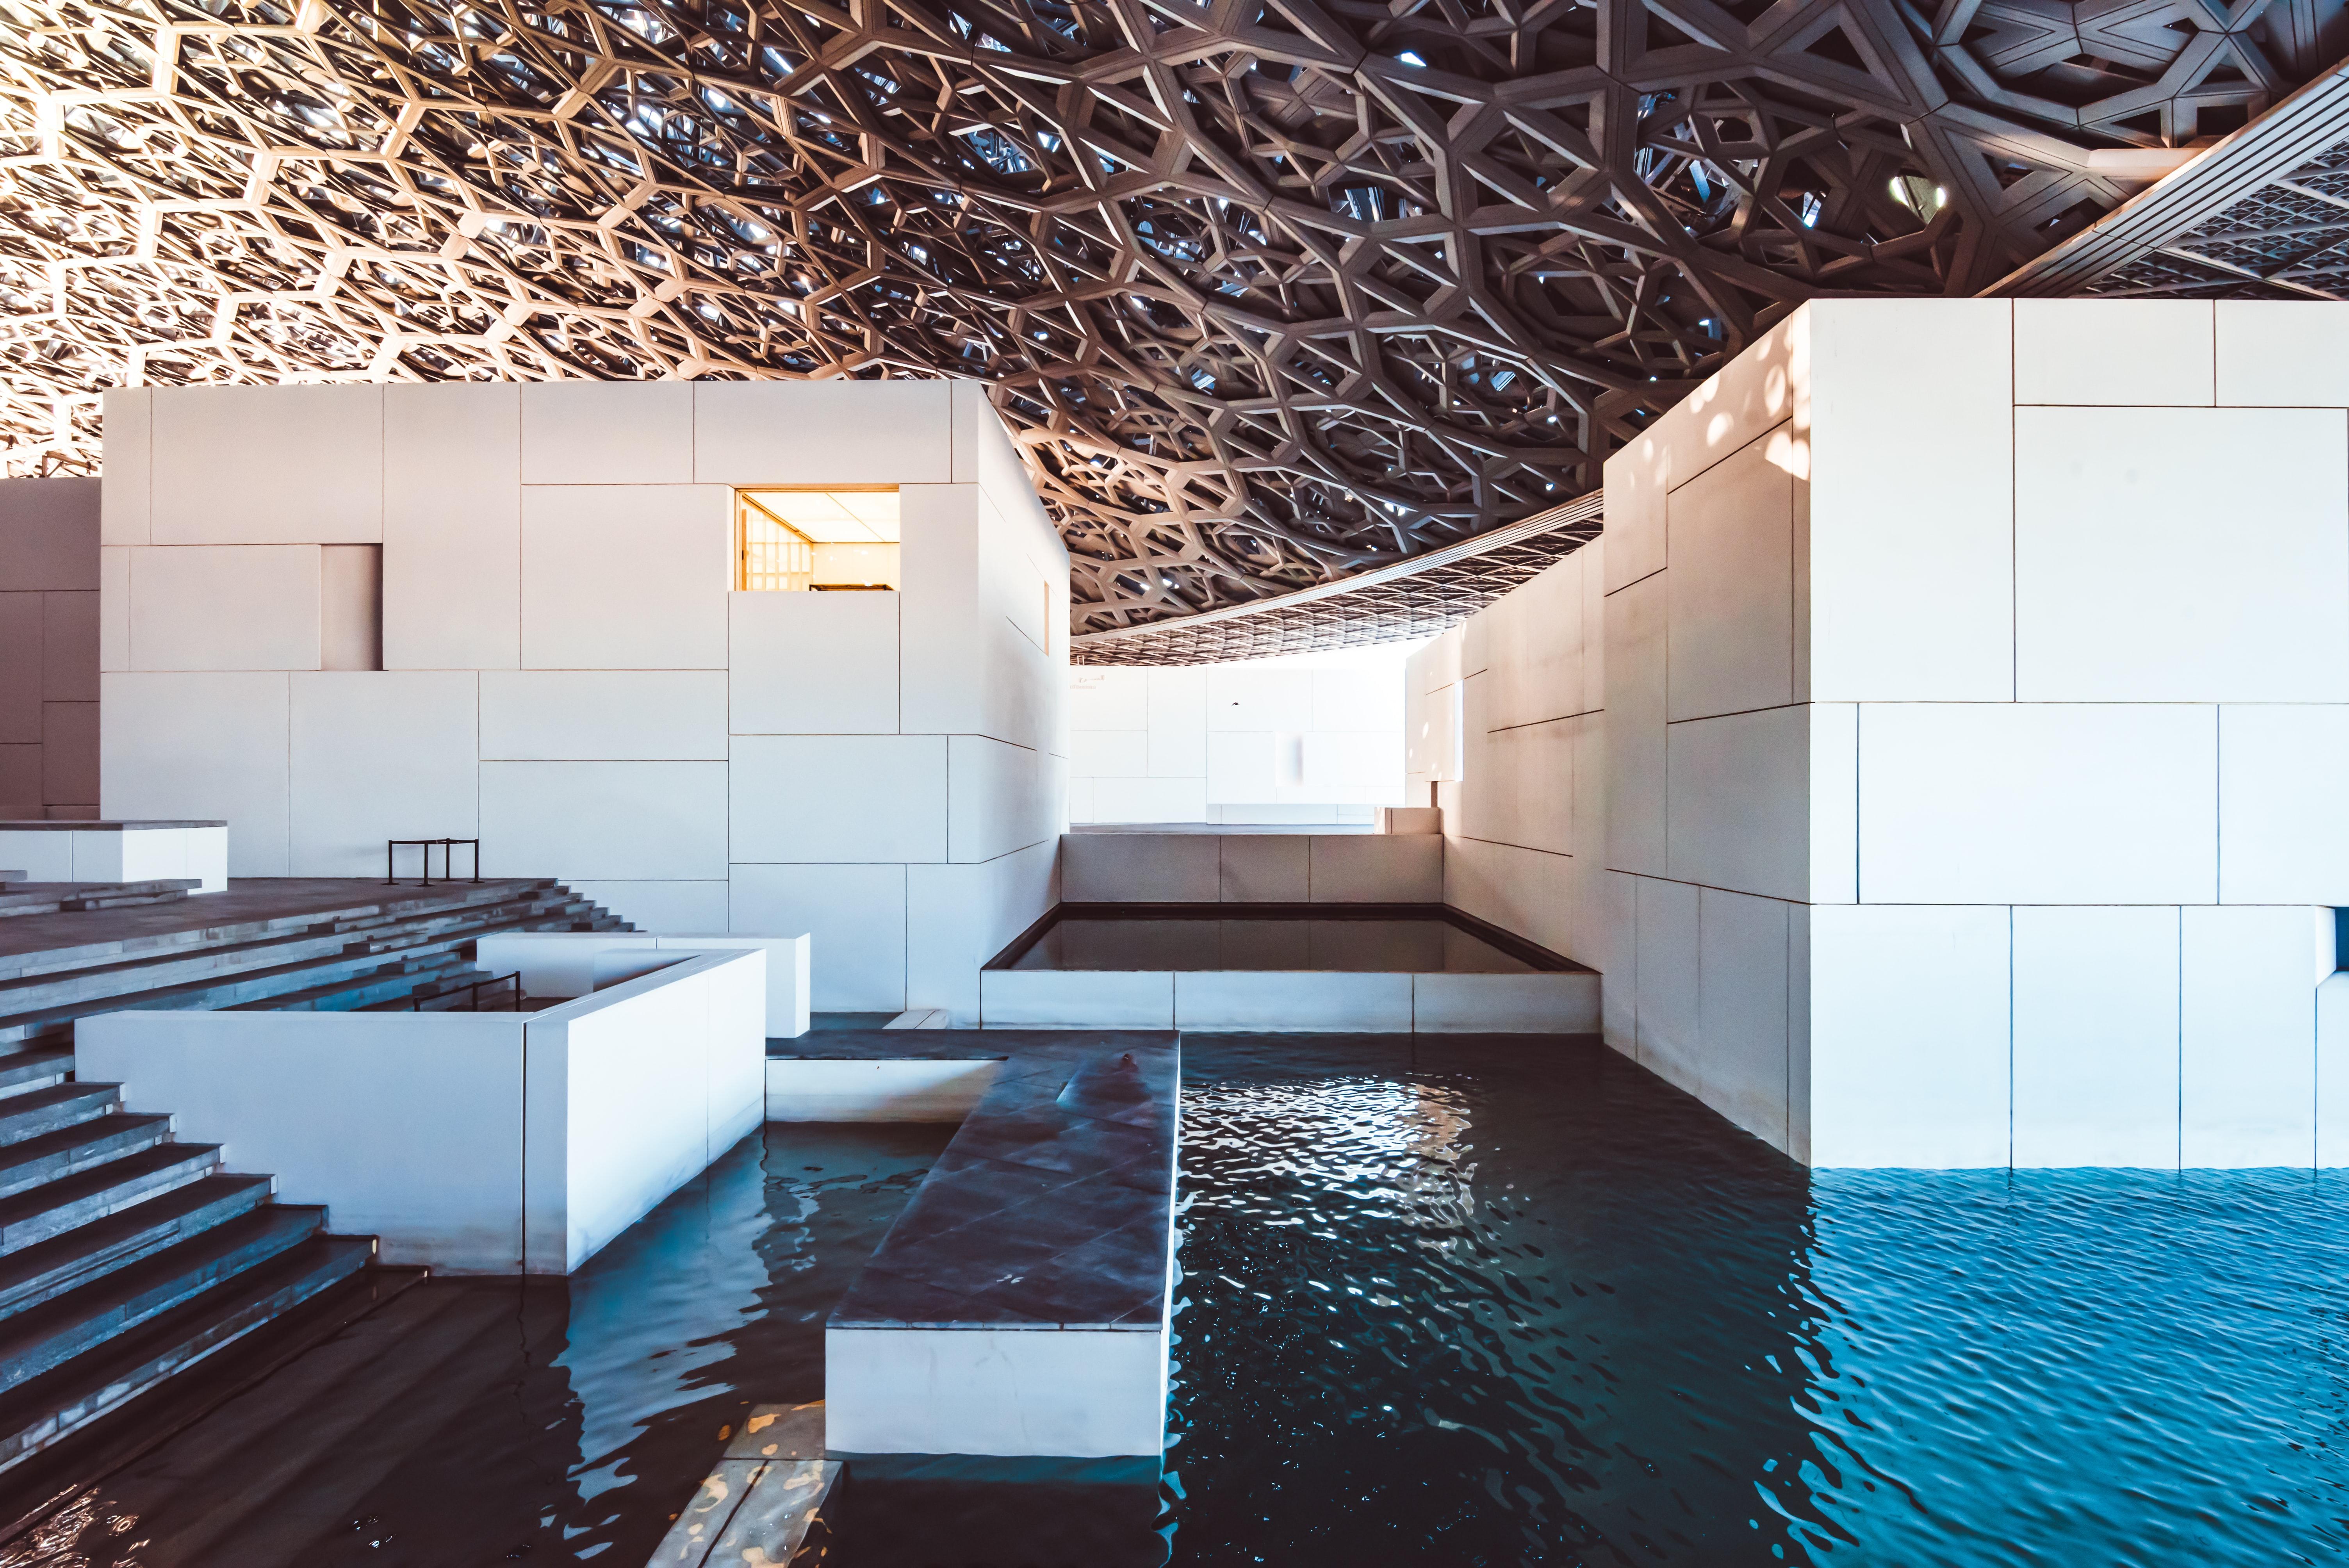 Louver Museum, Dubai Abu Dhabi tour itinerary